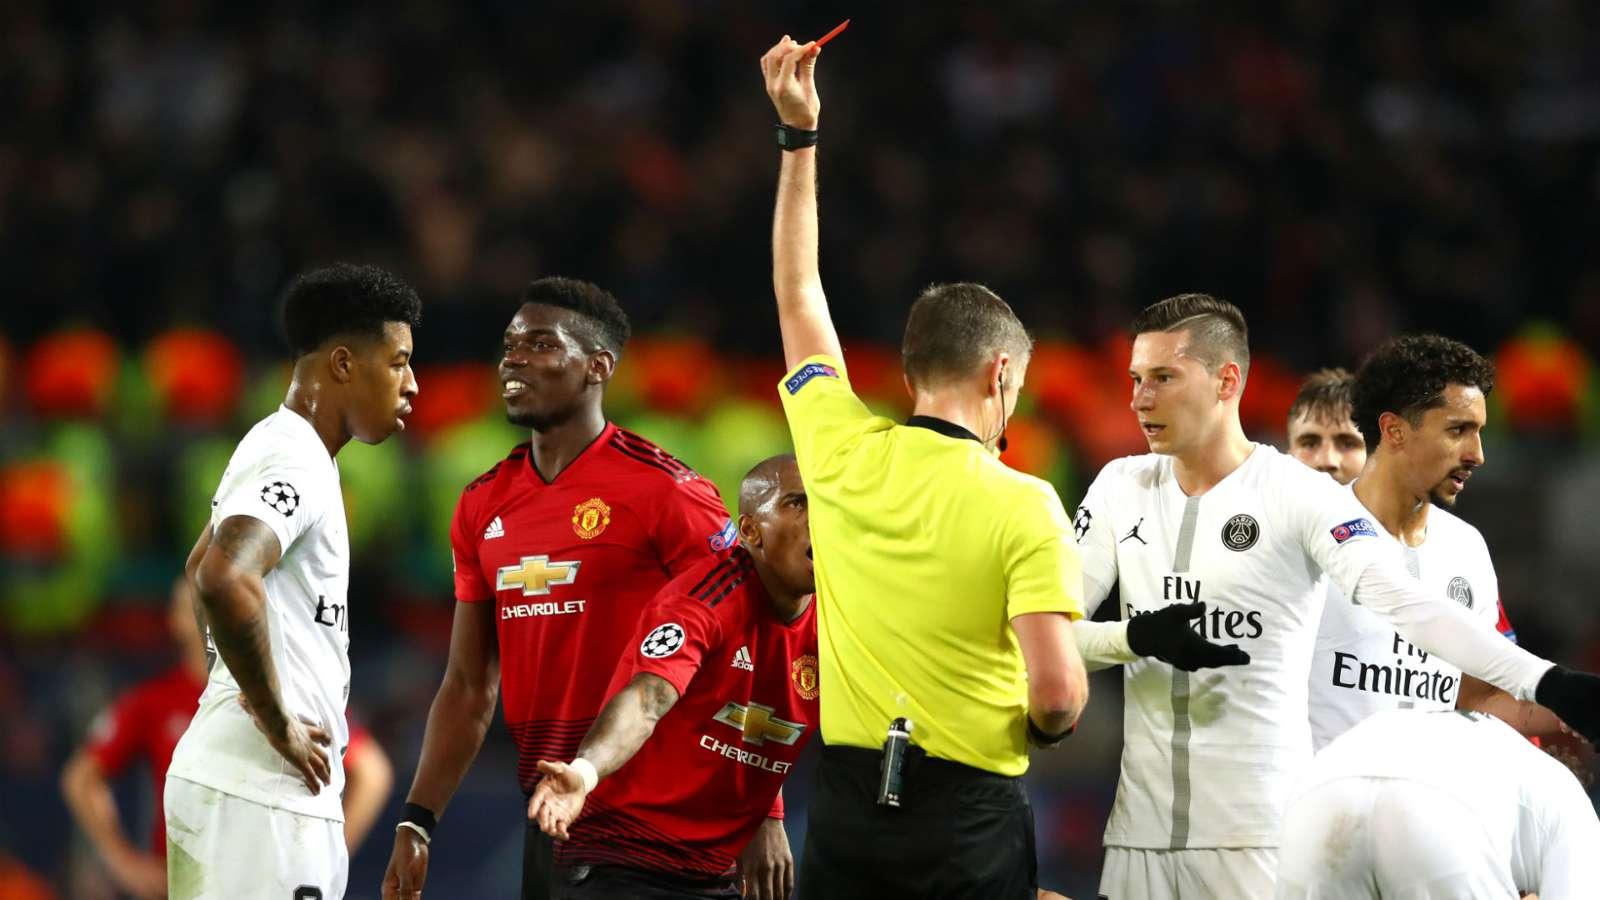 paulpogba cropped fwqjp42hrs721c1i6osbgsv28 - Manchester United vs Paris Saint-Germain 0-2: UEFA Champions League Match Report & Highlights